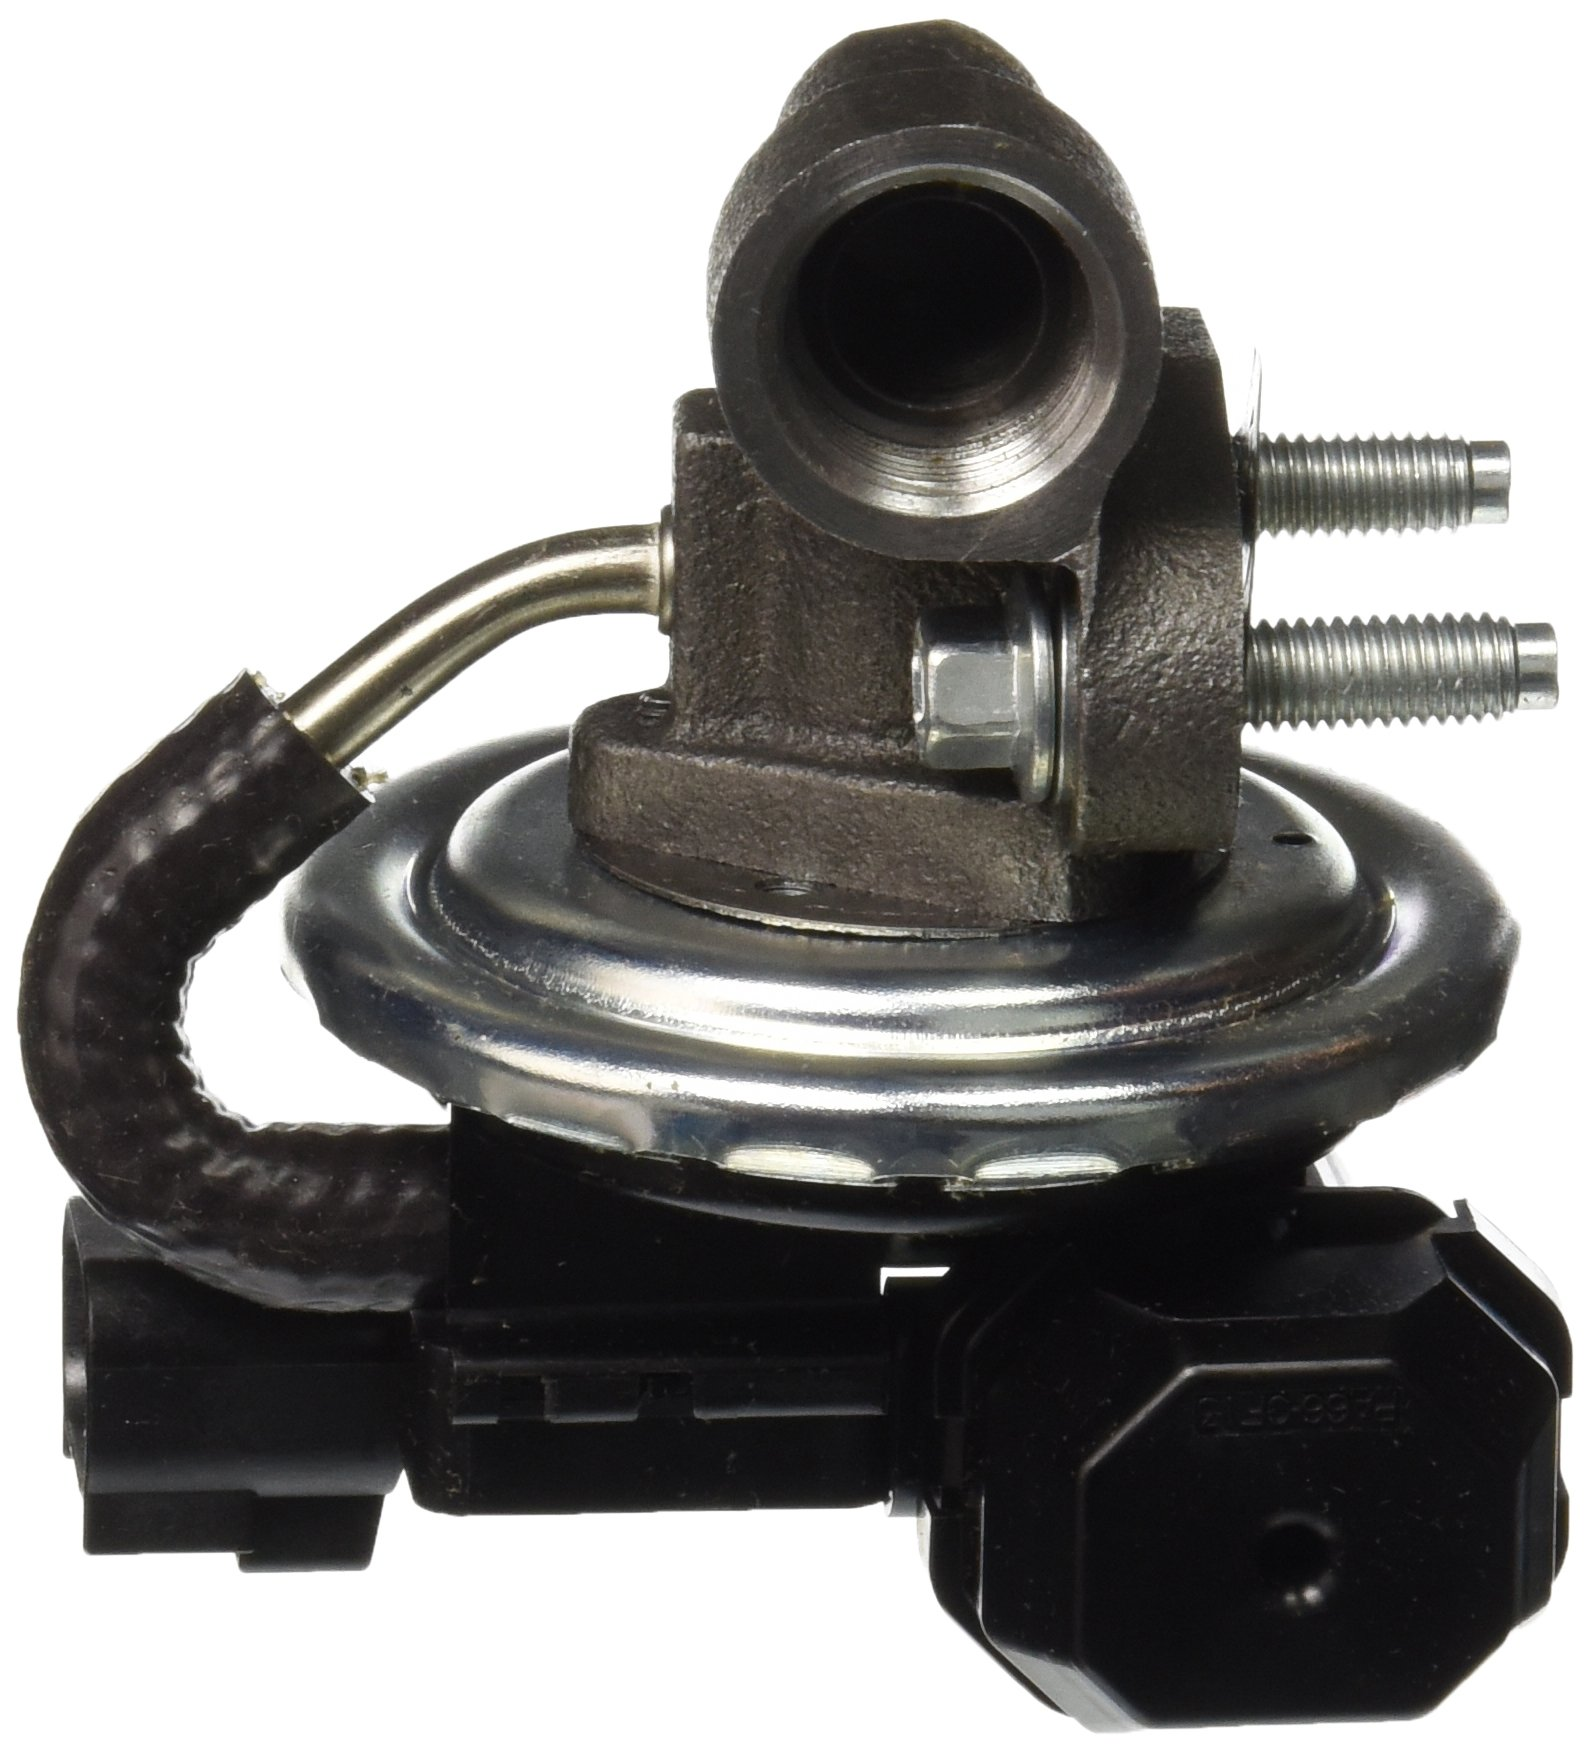 Motorcraft CX2060 Exhaust Gas Recirculation Position Sensor